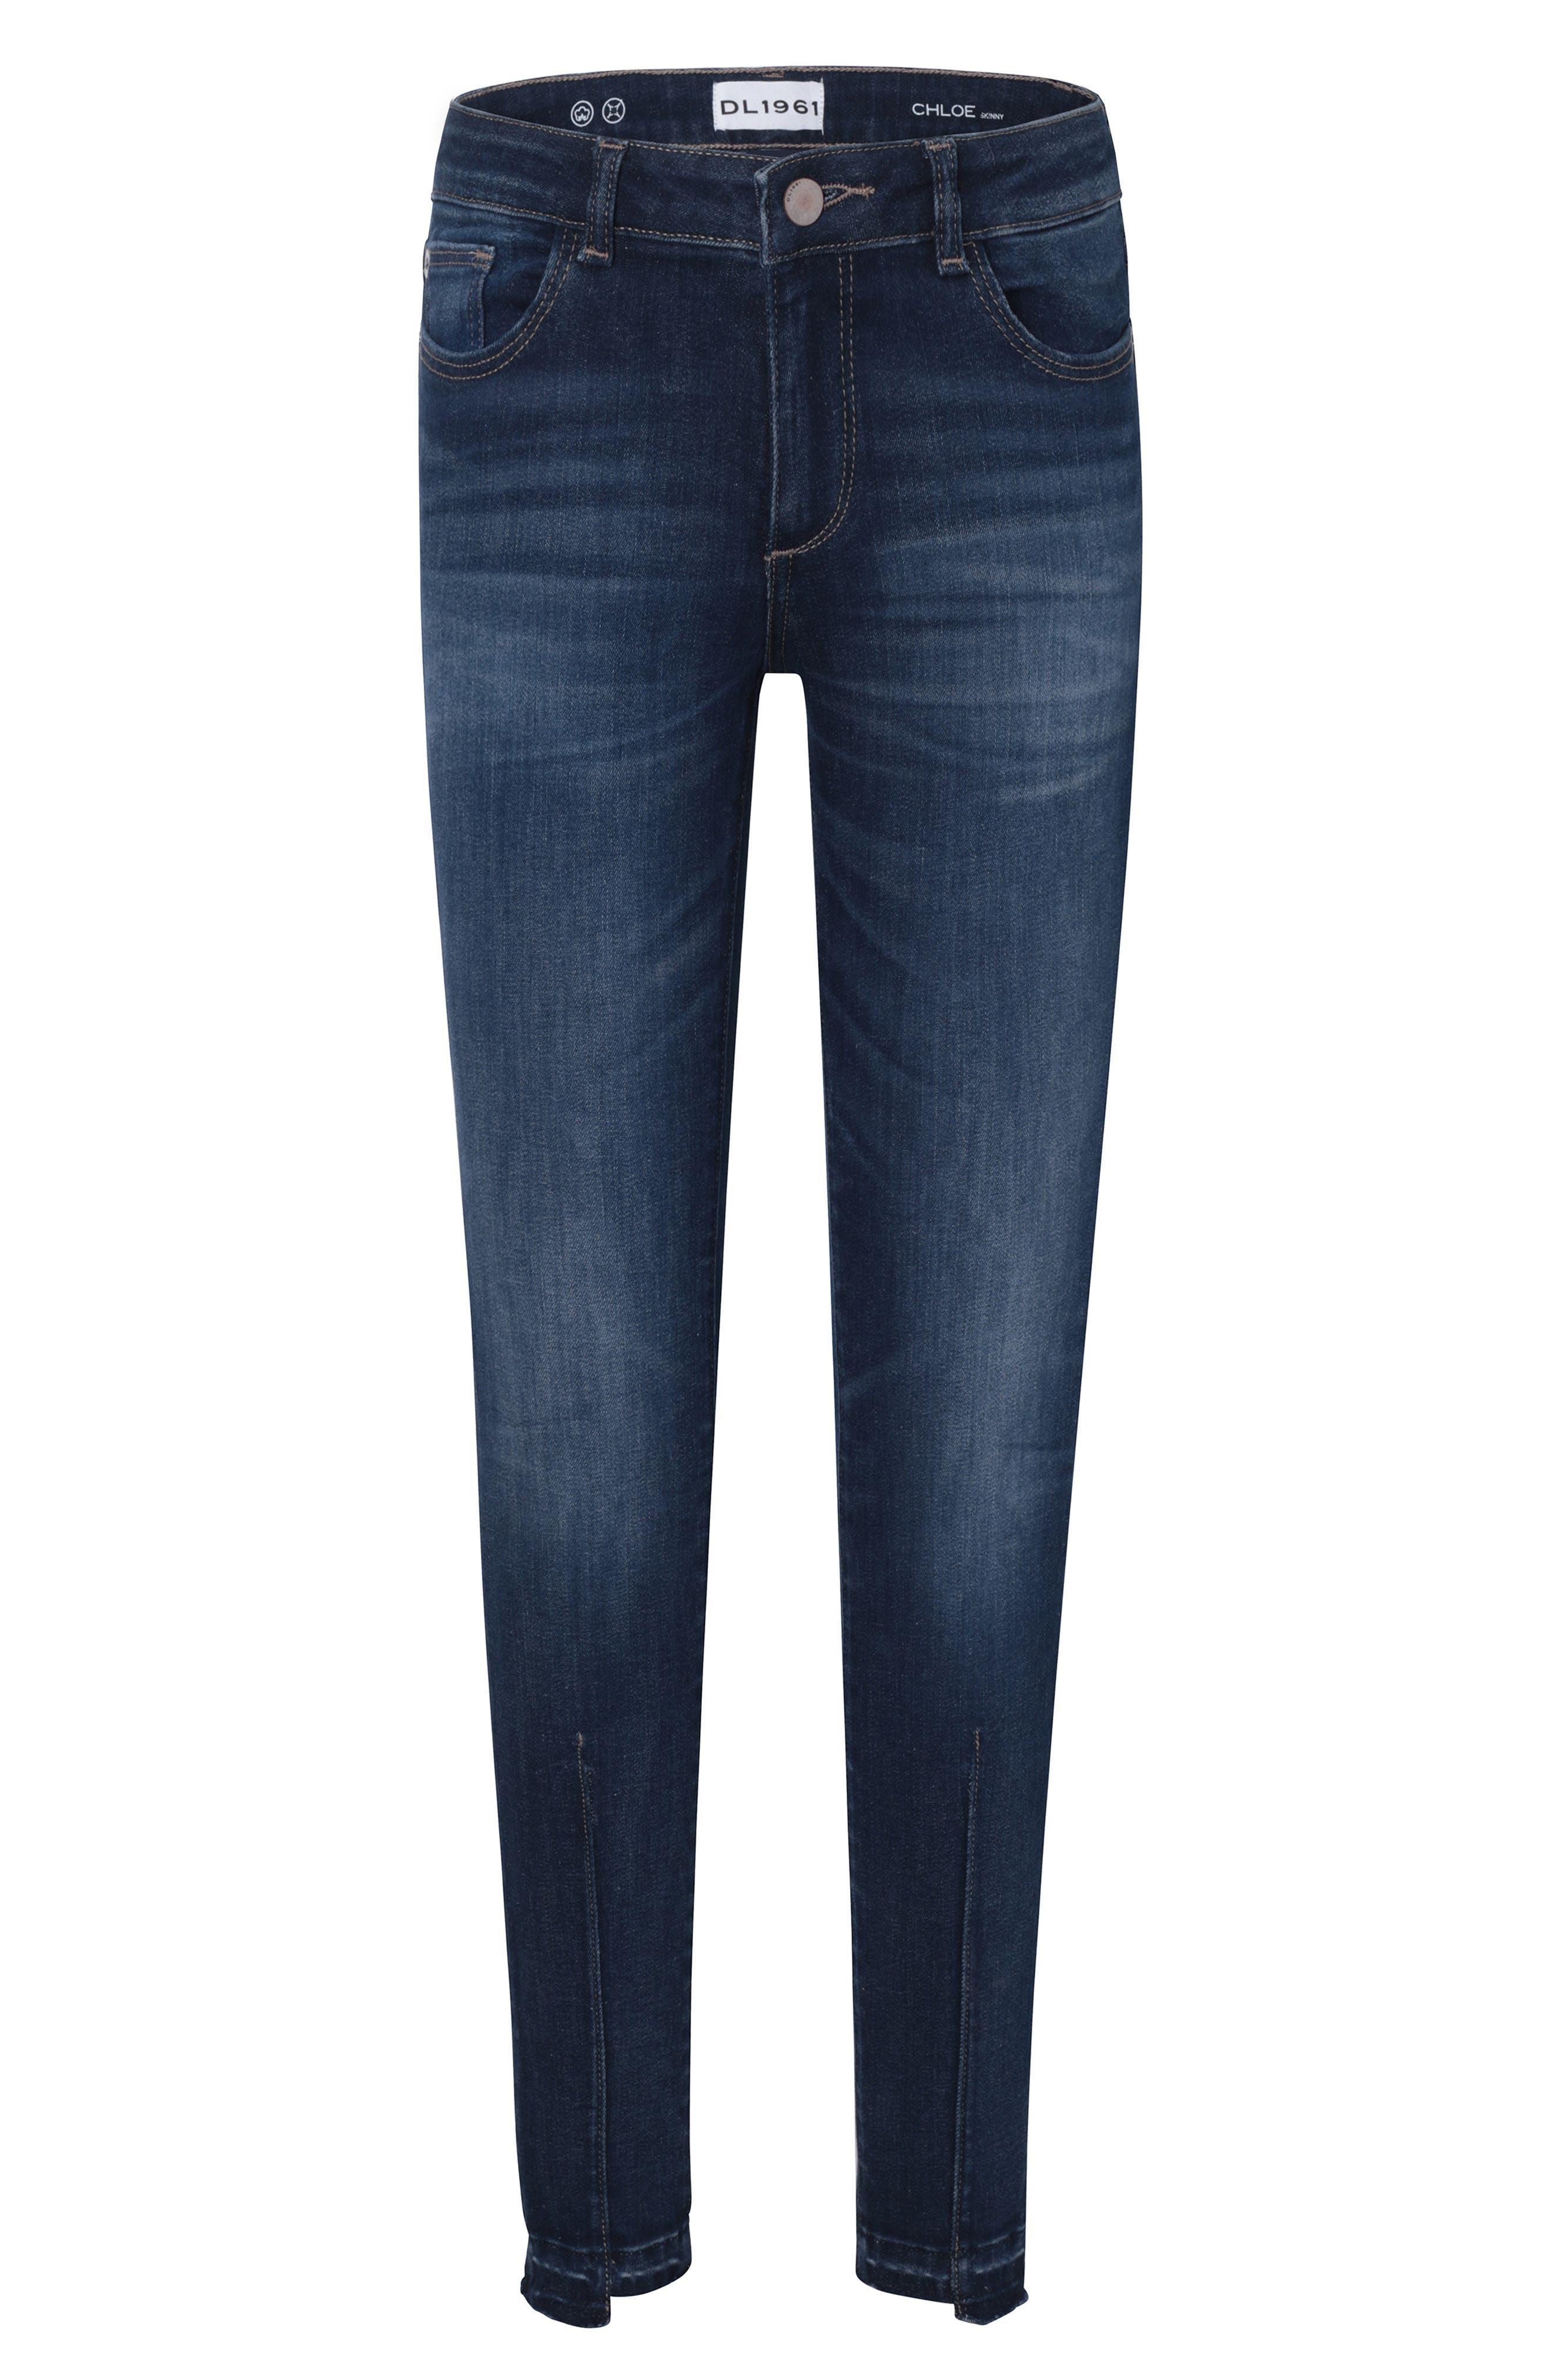 Chloe Step Hem Stretch Denim Skinny Jeans,                         Main,                         color, LIMELIGHT